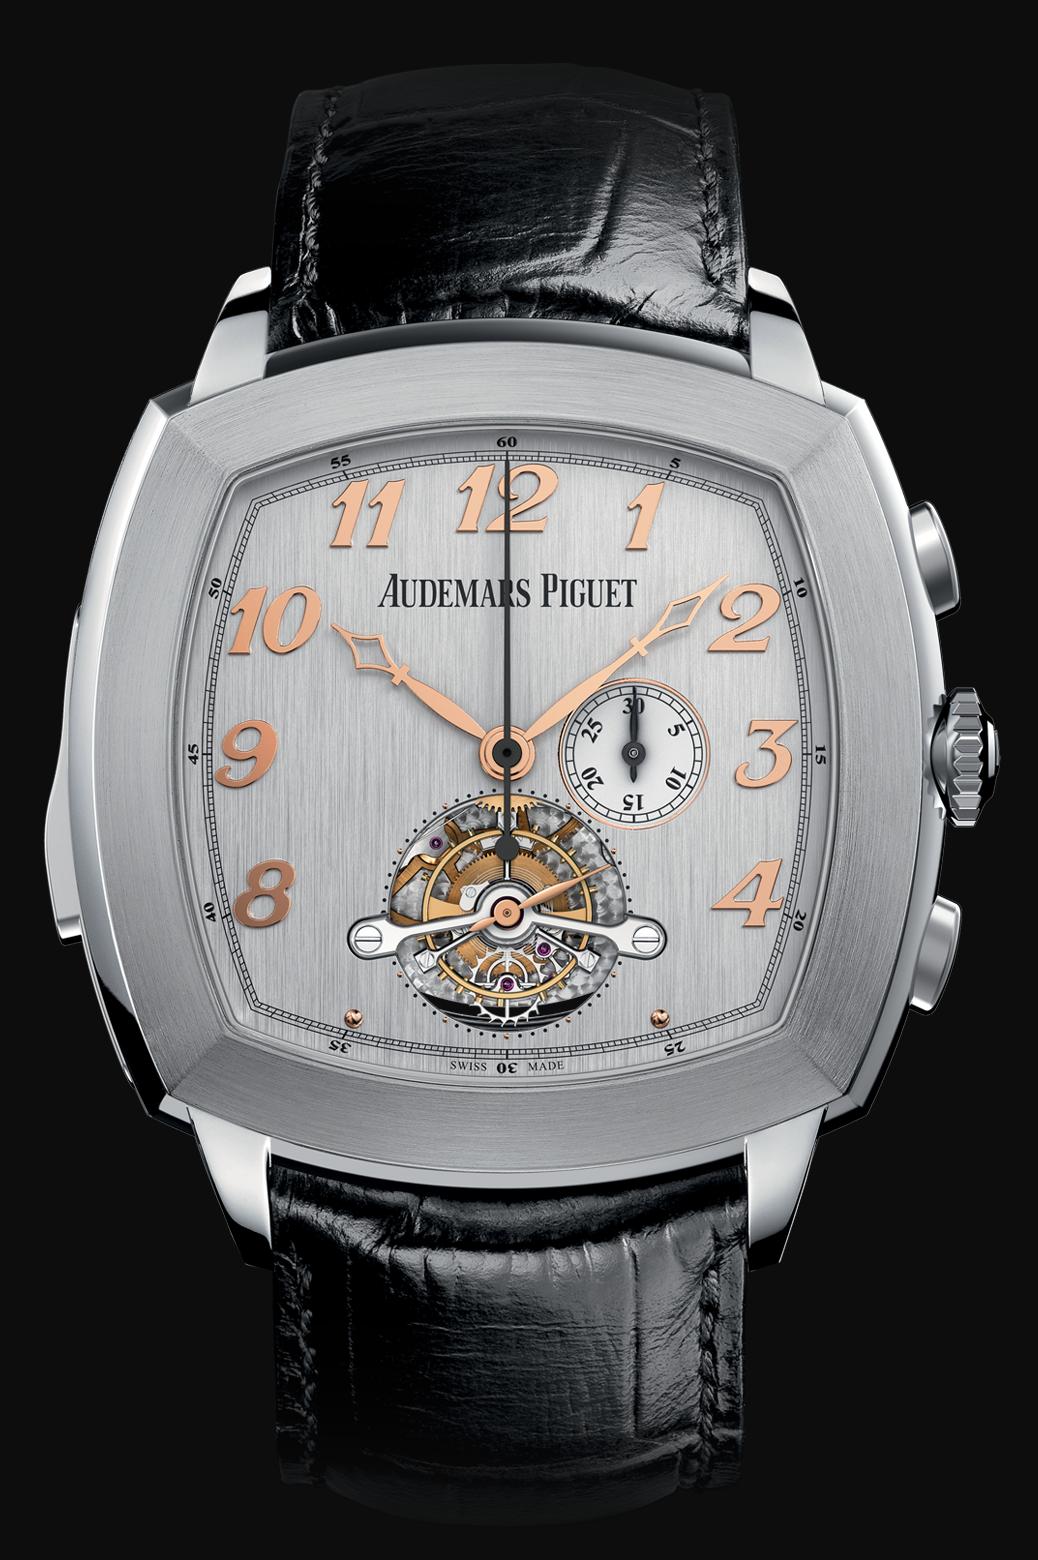 db7105ab26b Audemars Piguet Tradition Tourbillon Minute Repeater Chronograph ...